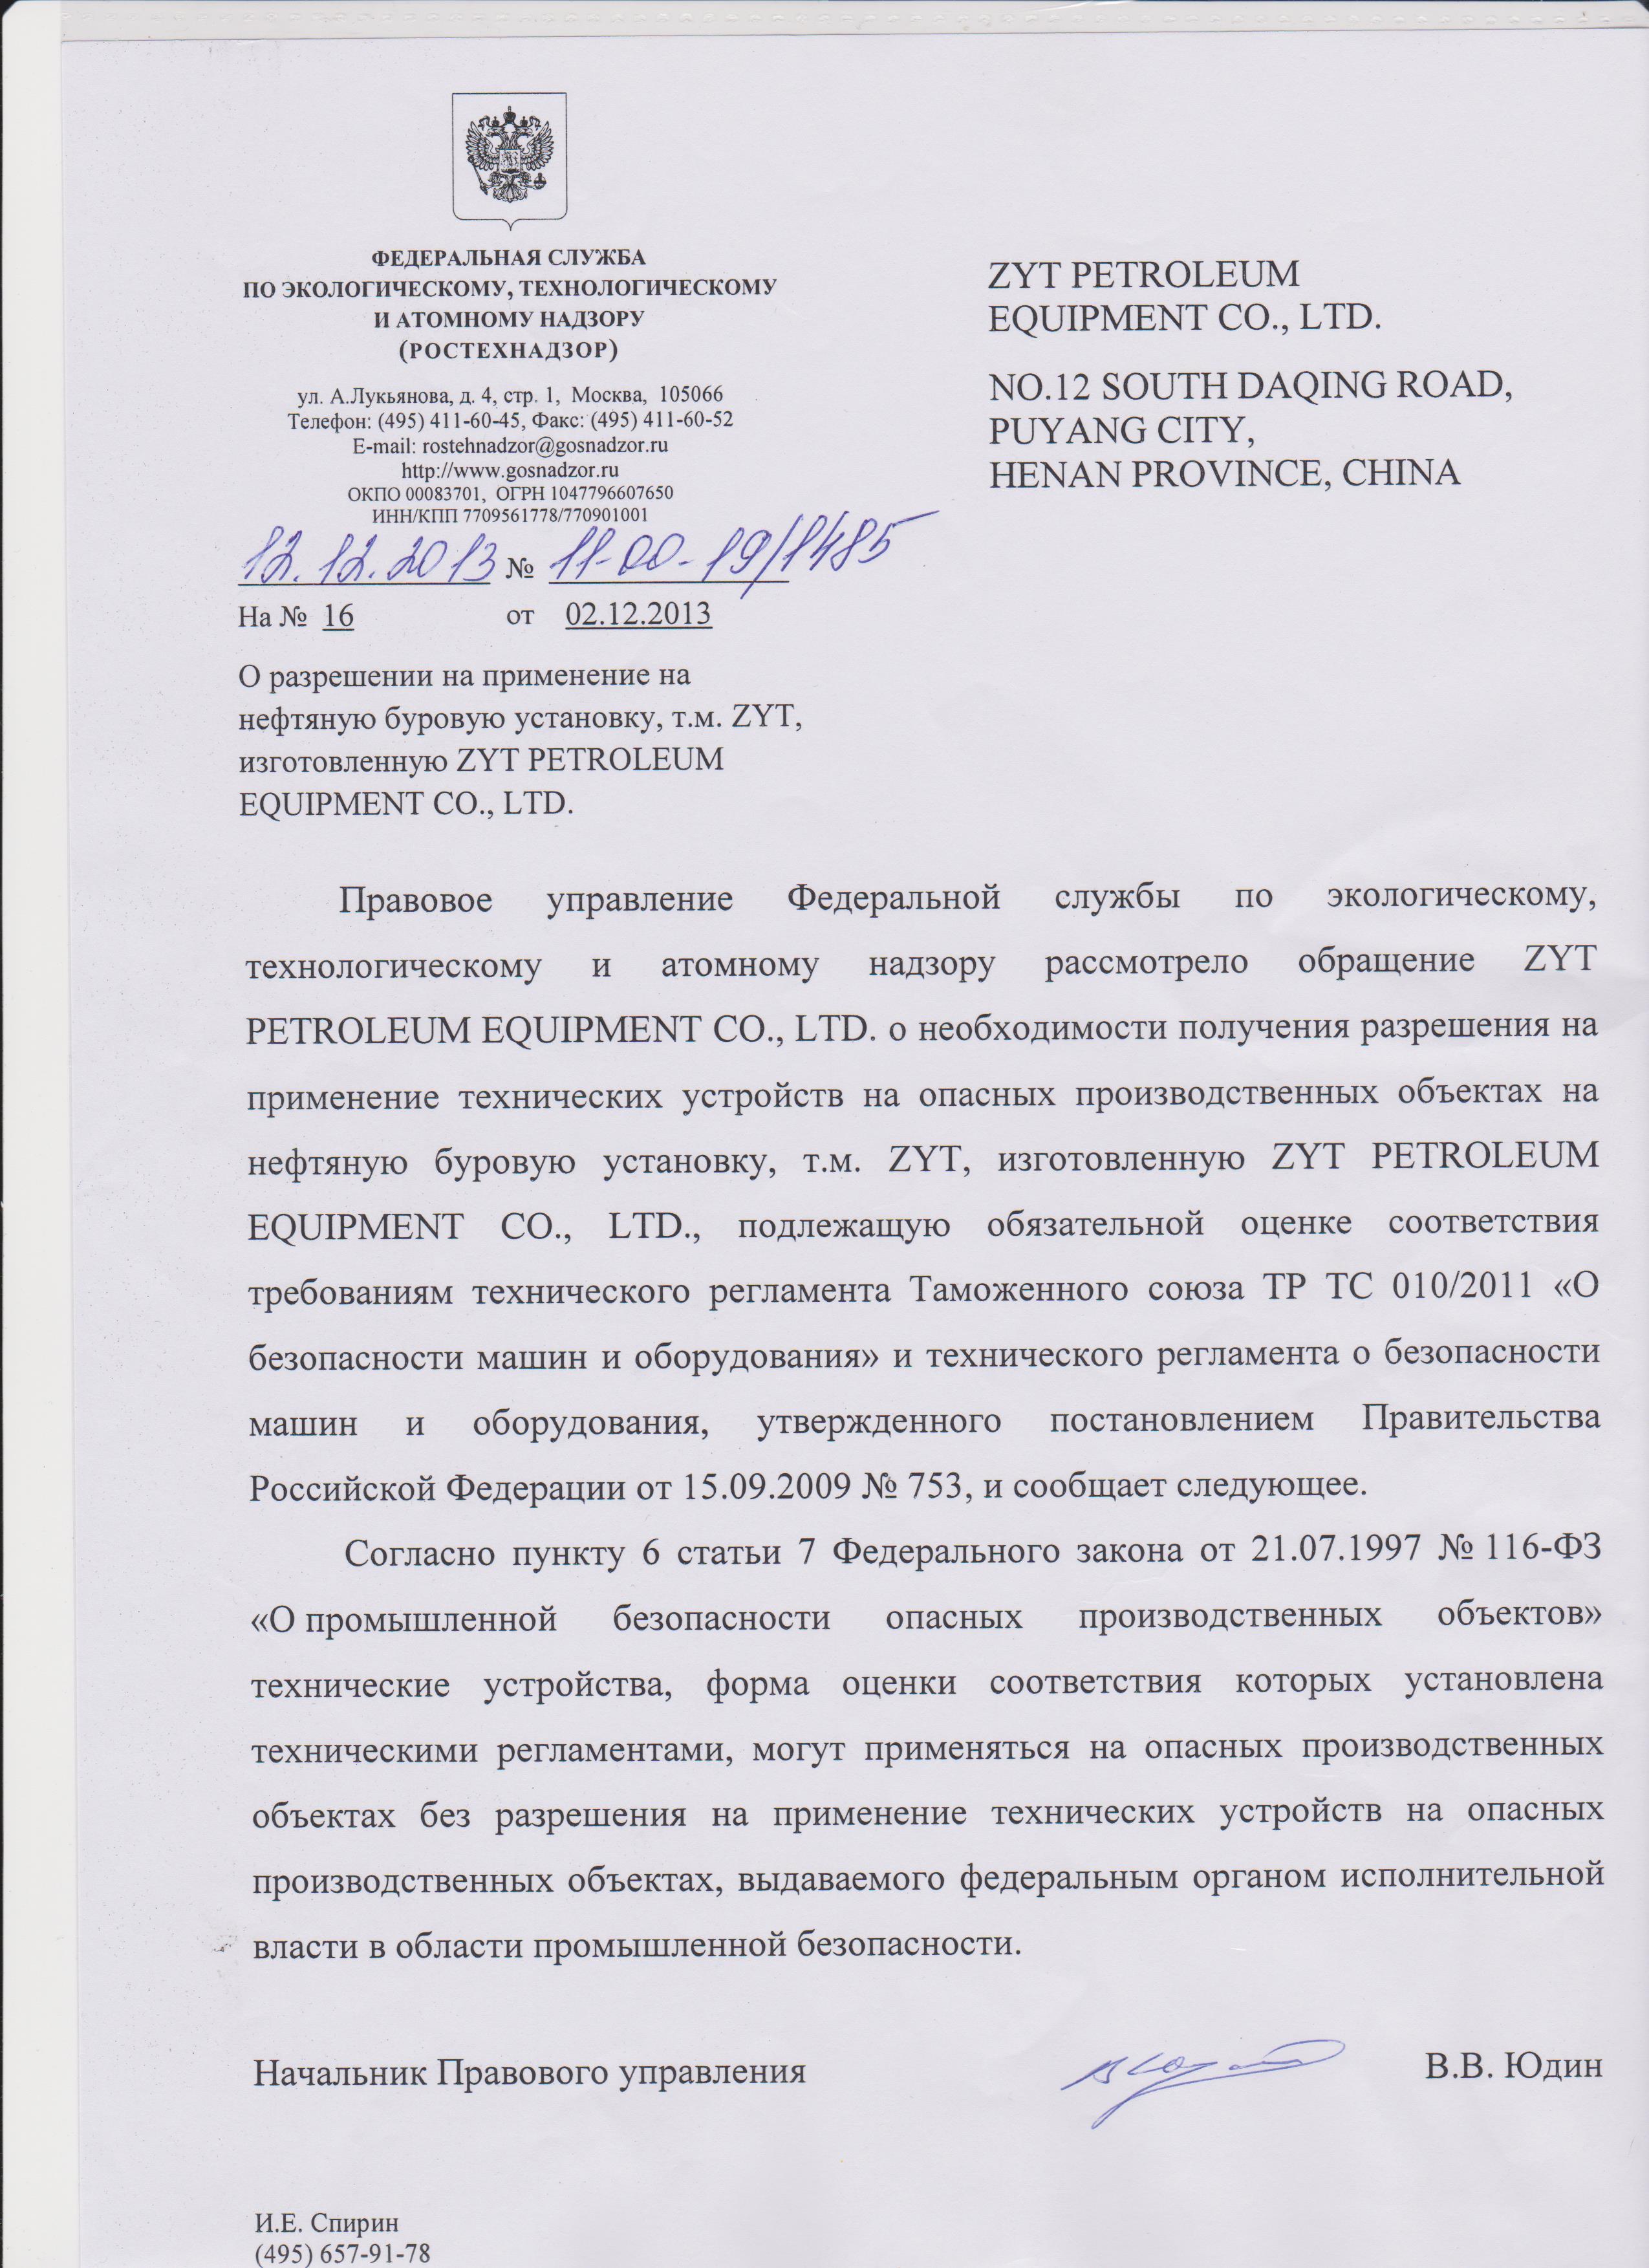 RTN认证,俄罗斯工业设备安装使用许可证,RTN认证,RTN许可,RTN